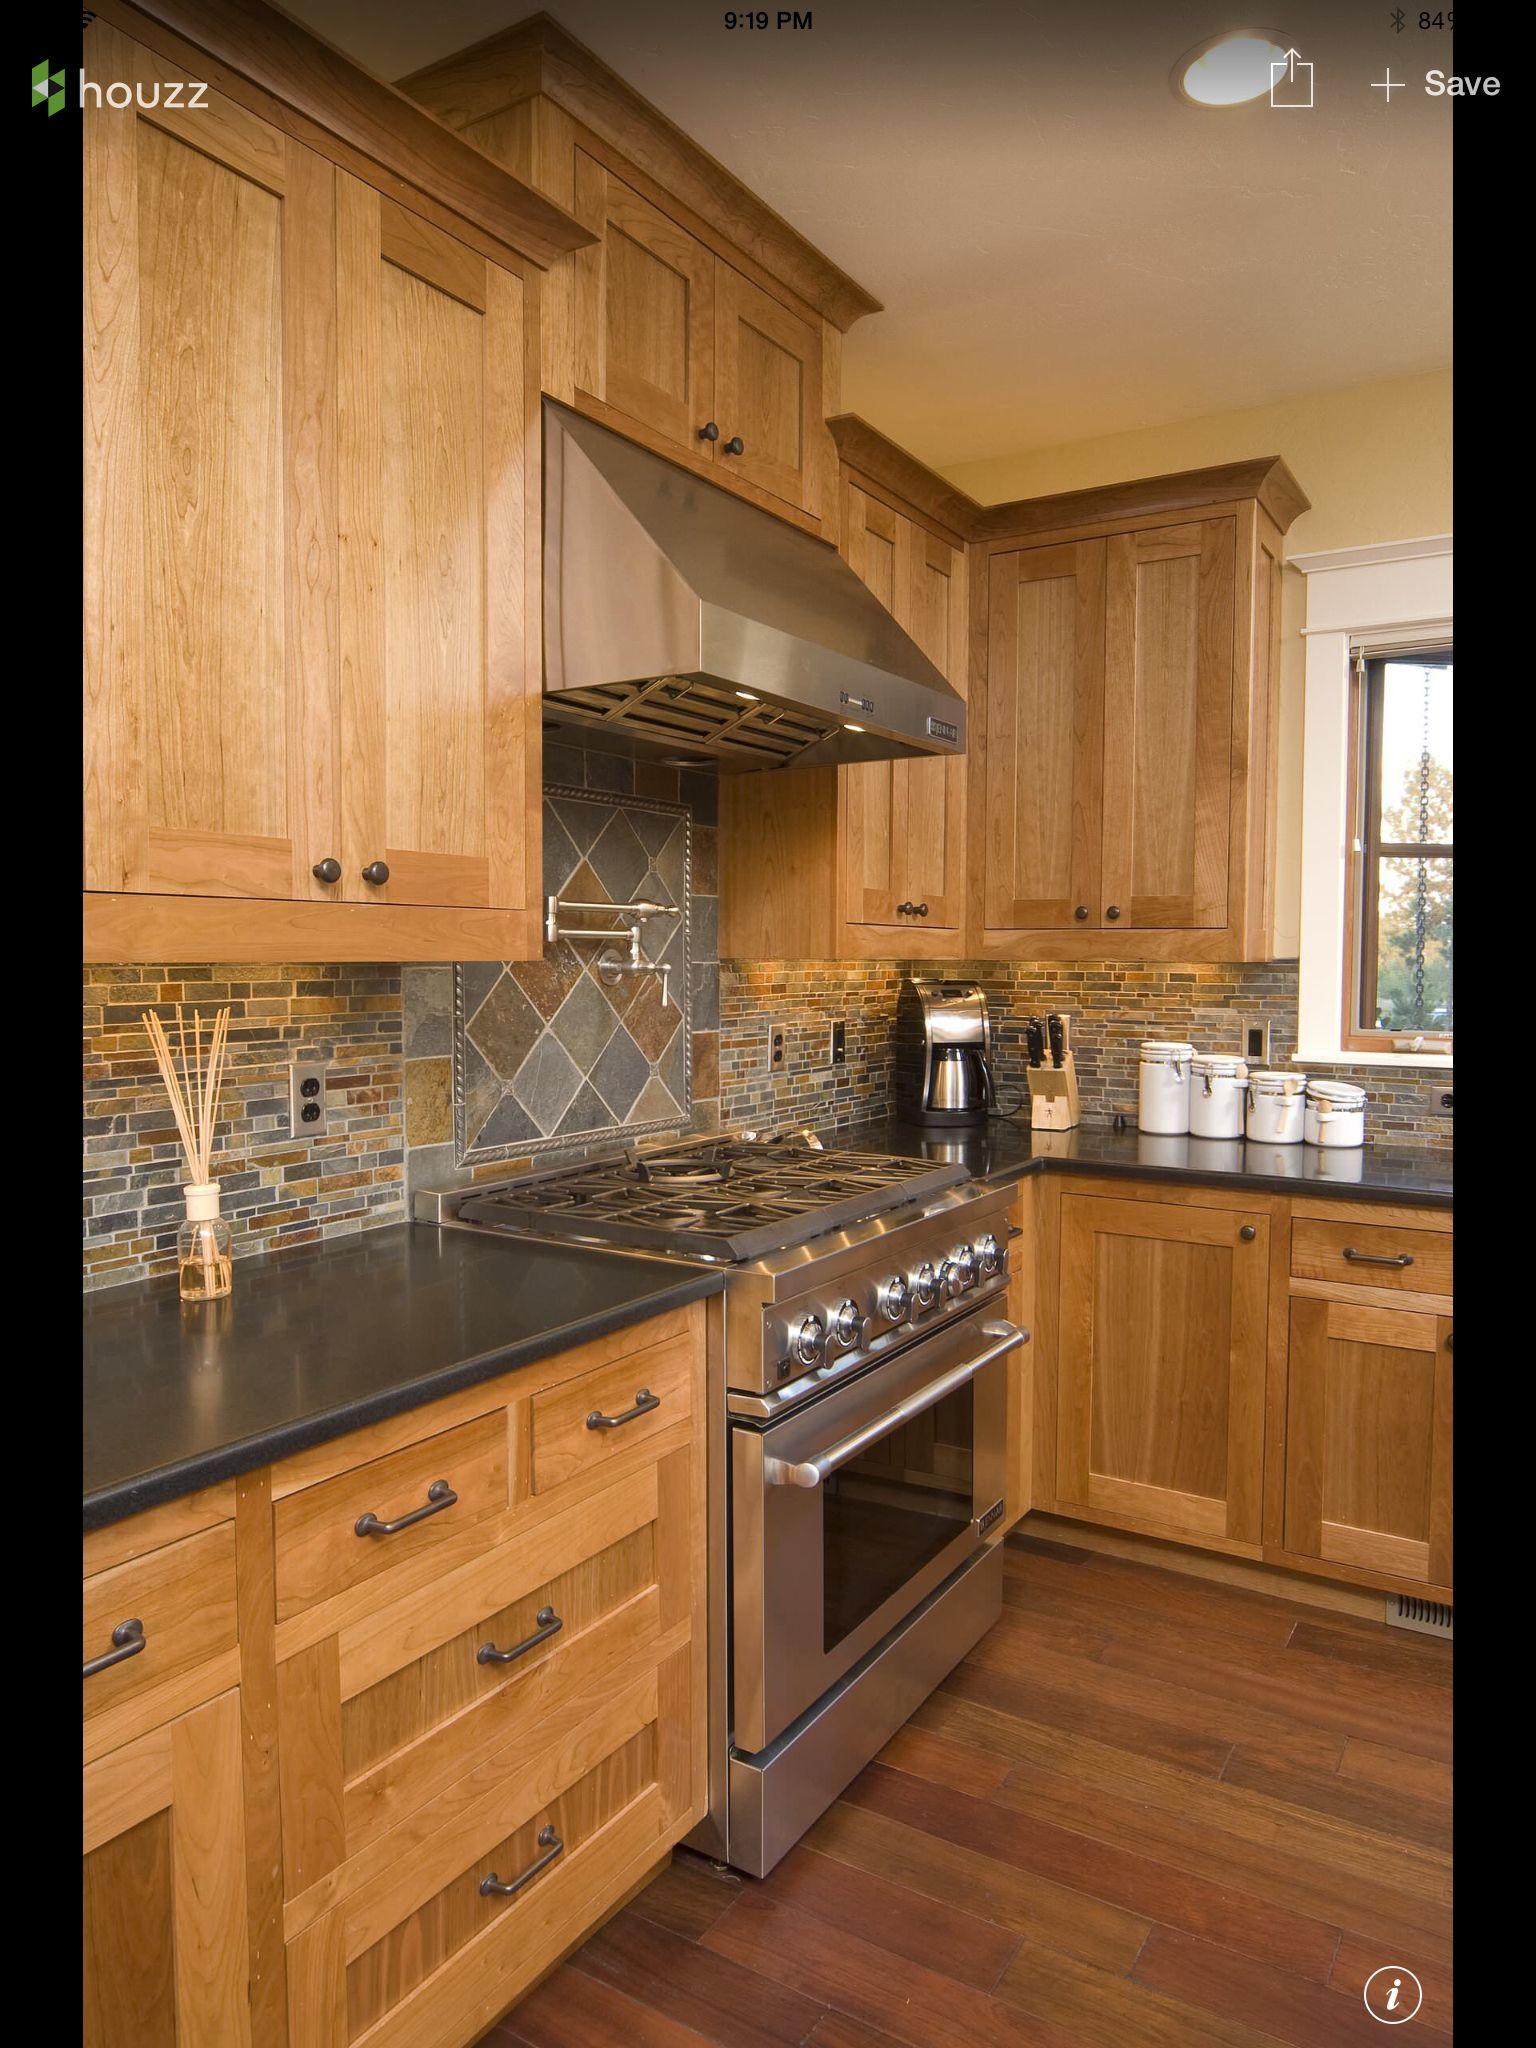 Houzz Hickory Cabinets Traditional Kitchen Design Rustic Kitchen Kitchen Design